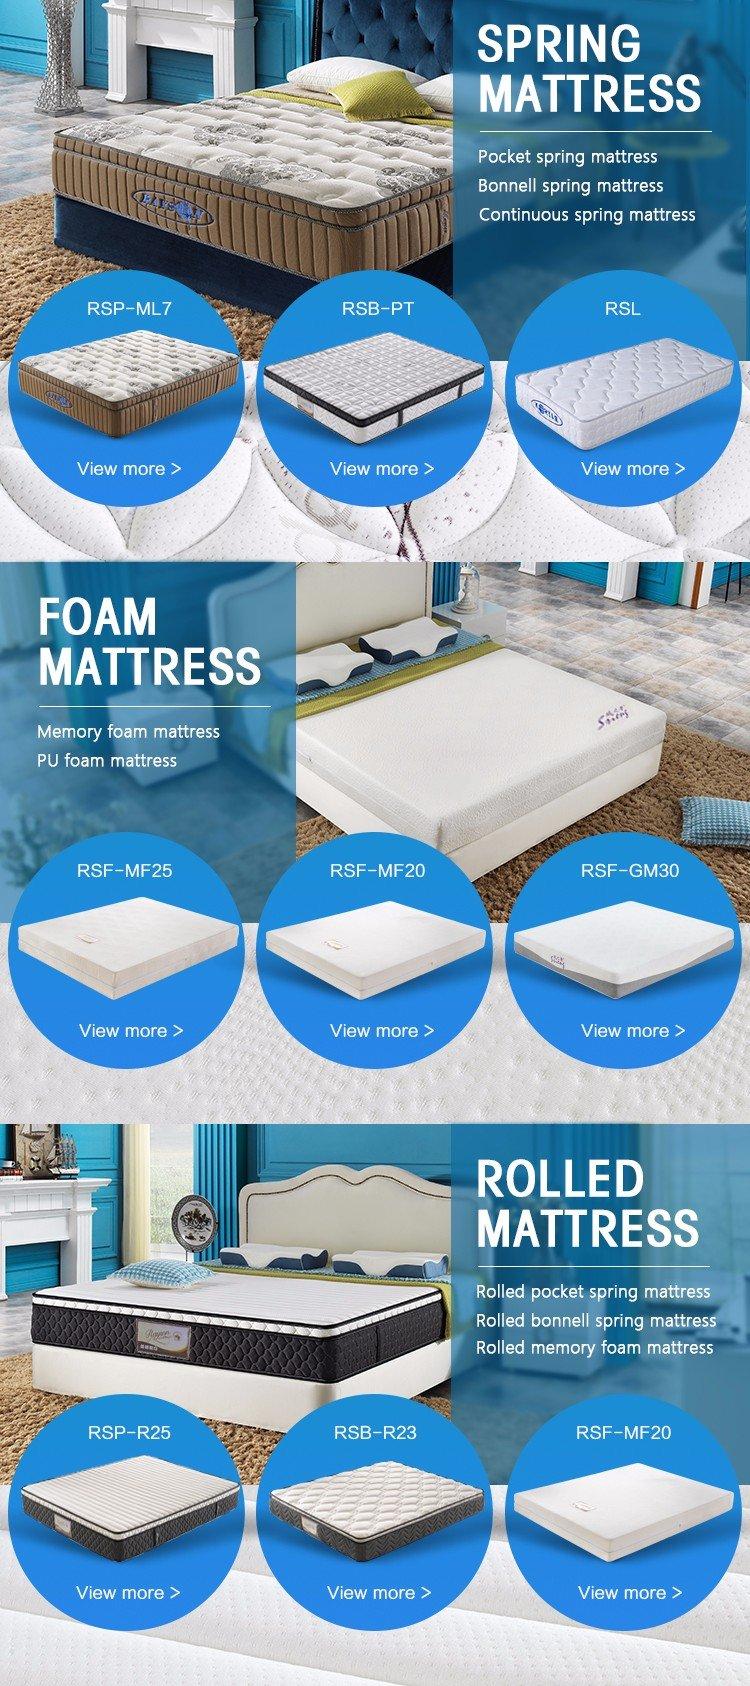 Rayson Mattress Latest 3000 pocket sprung mattress Suppliers-10